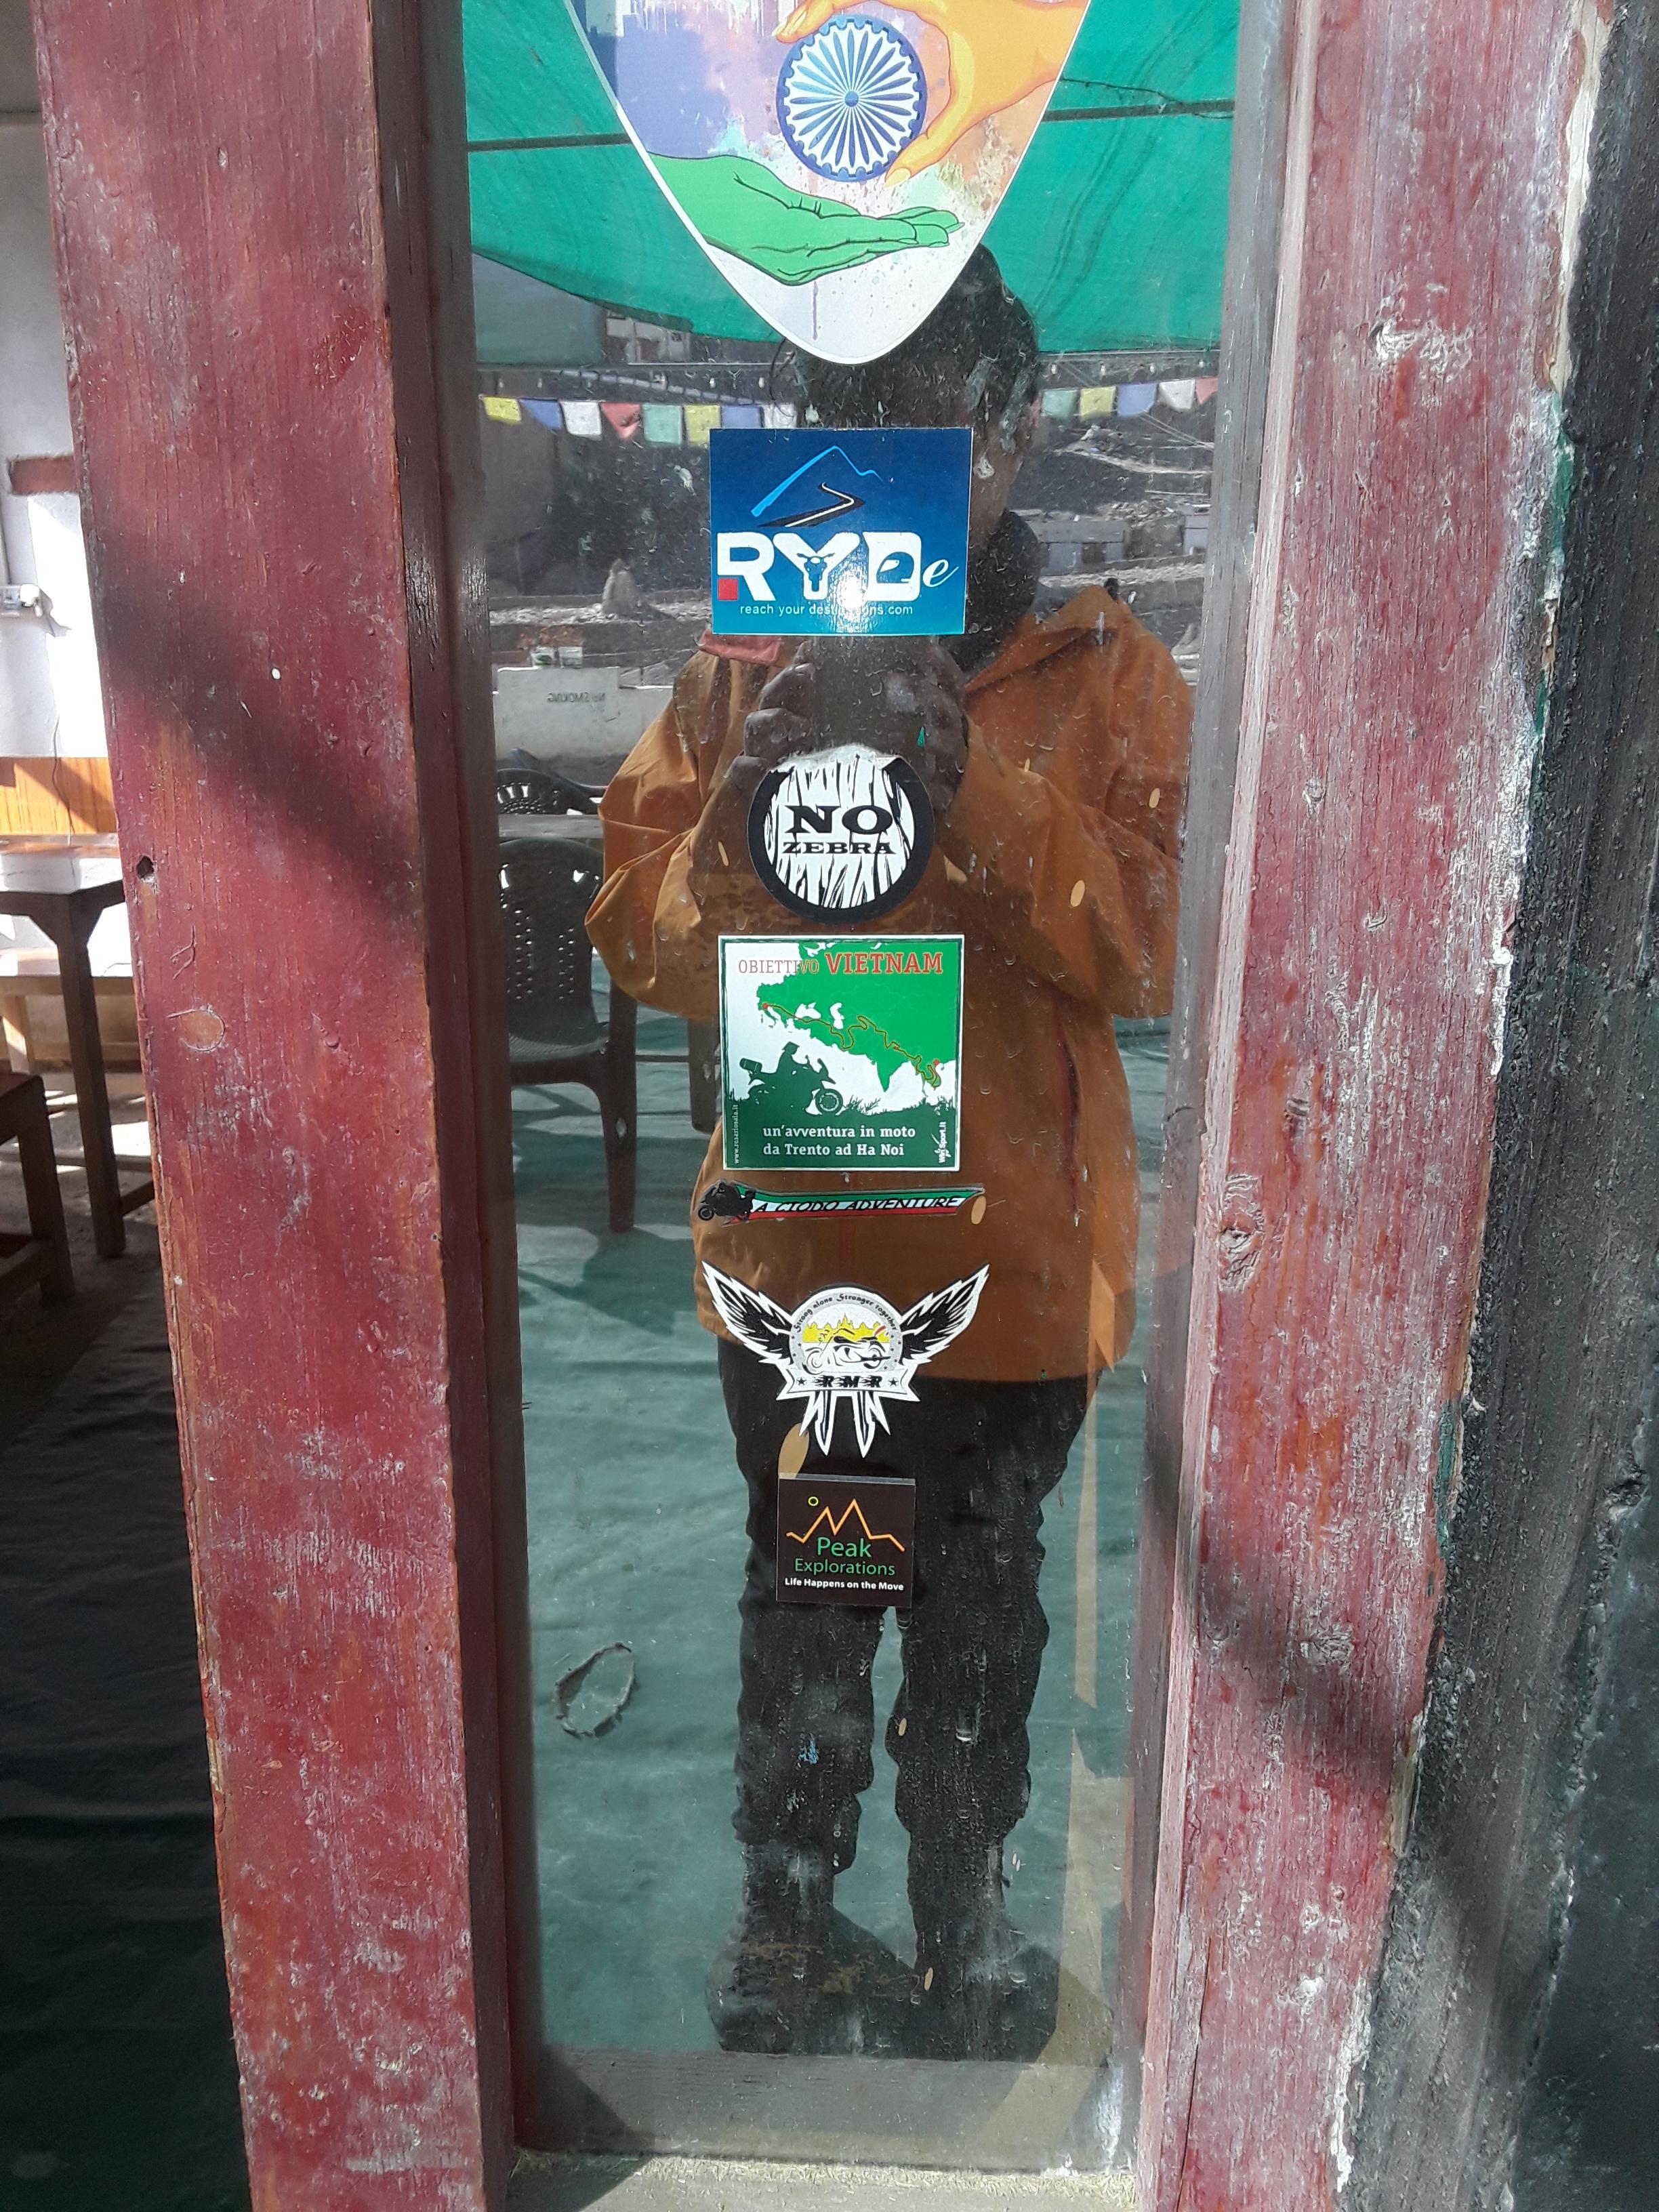 PEAK EXPLORATIONS - my social enterprise has been added to the slew of stickers in Lamayuru.